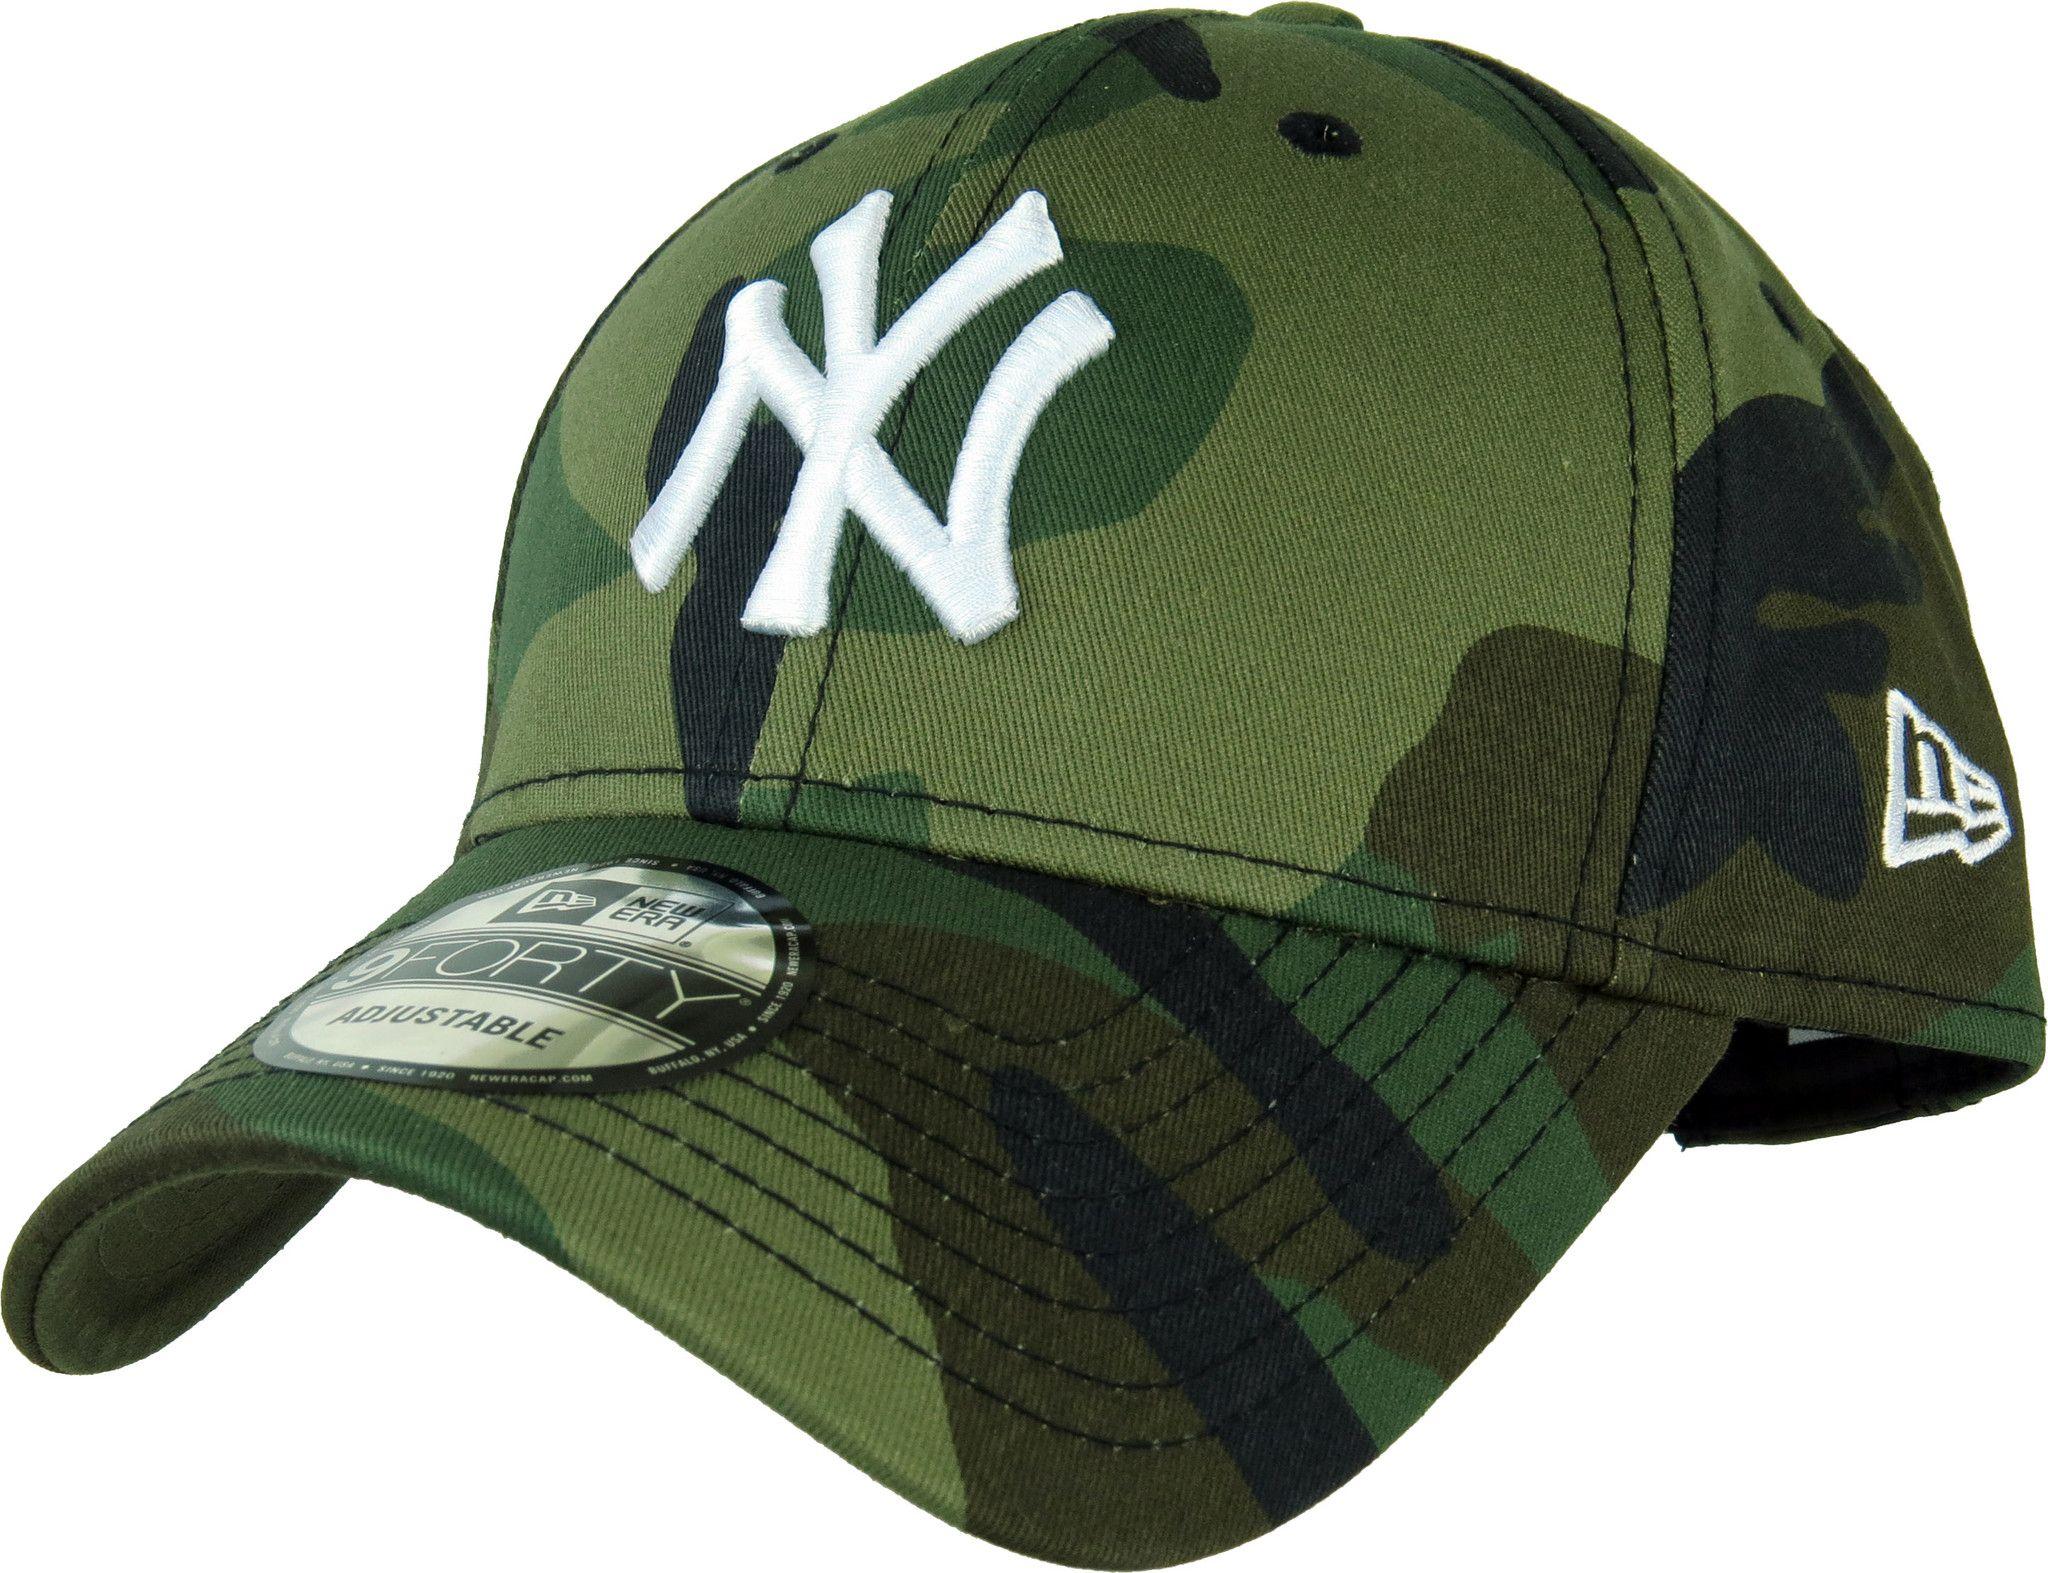 ... closeout new era 940 league essential ny yankees baseball cap woodland  camo with the white ny 651dc33189e